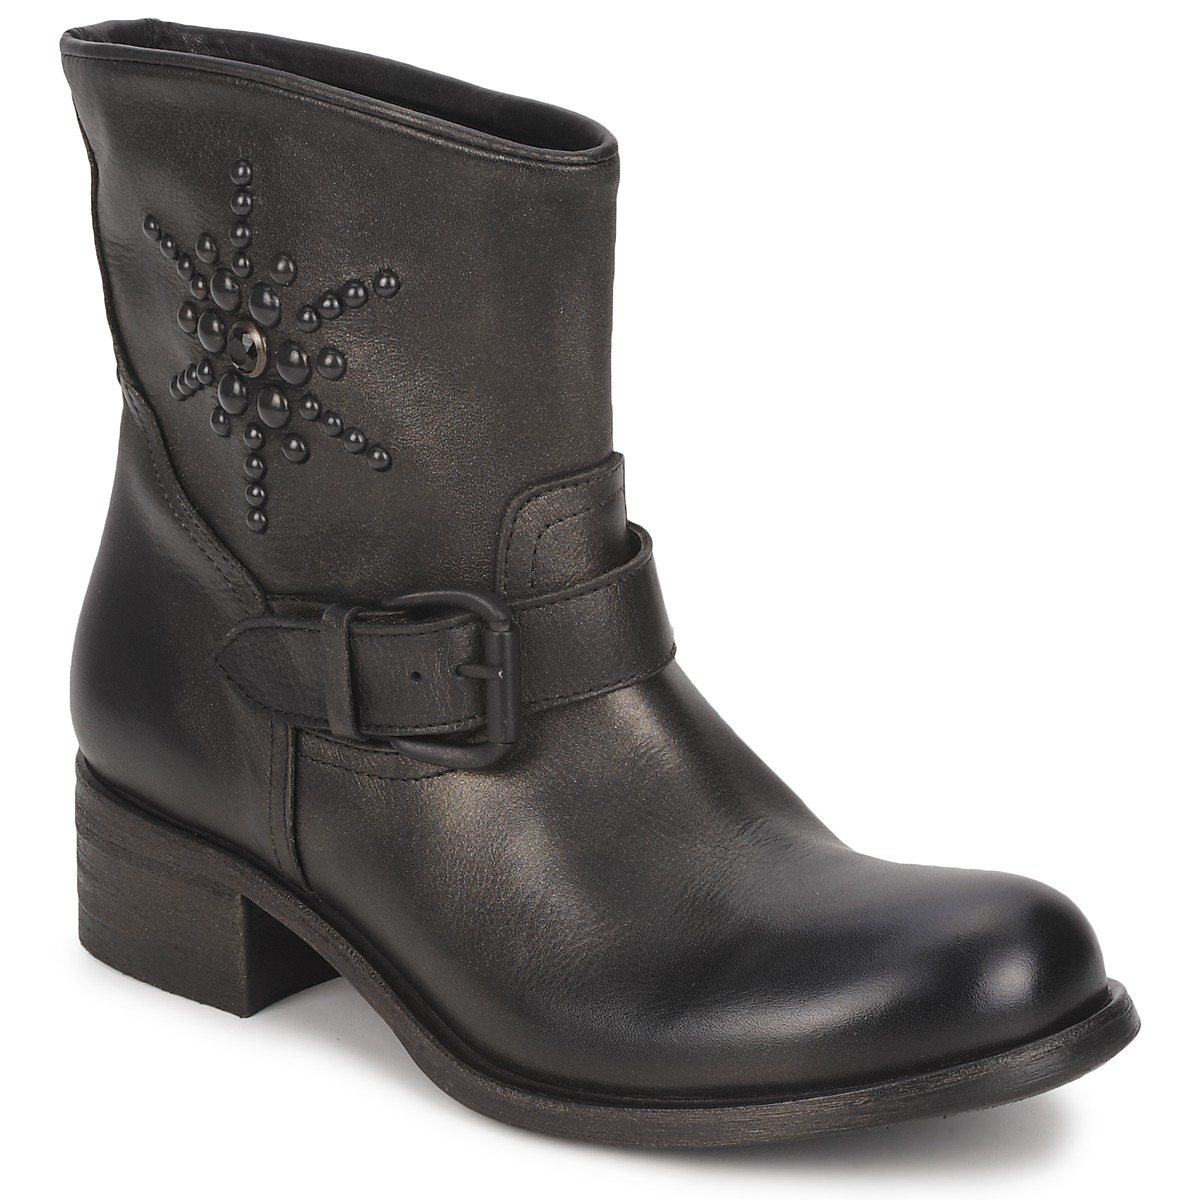 JFK OSSIR Schwarz - Kostenloser Versand bei Spartoode ! - Schuhe Boots Damen 139,50 €